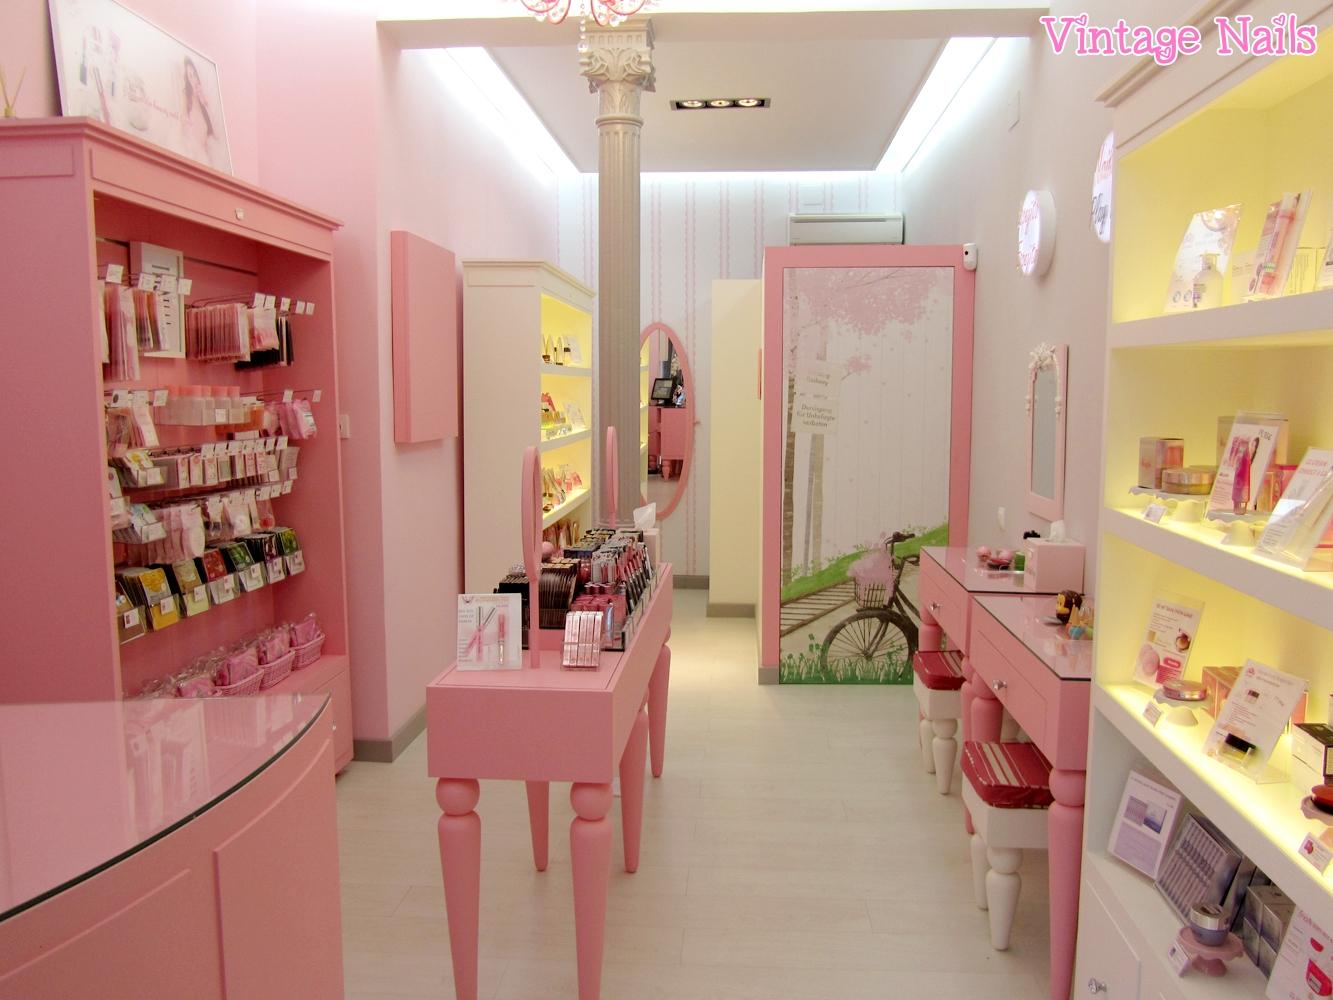 Wangbii: tienda de cosmética coreana en Madrid - Vintage Nails